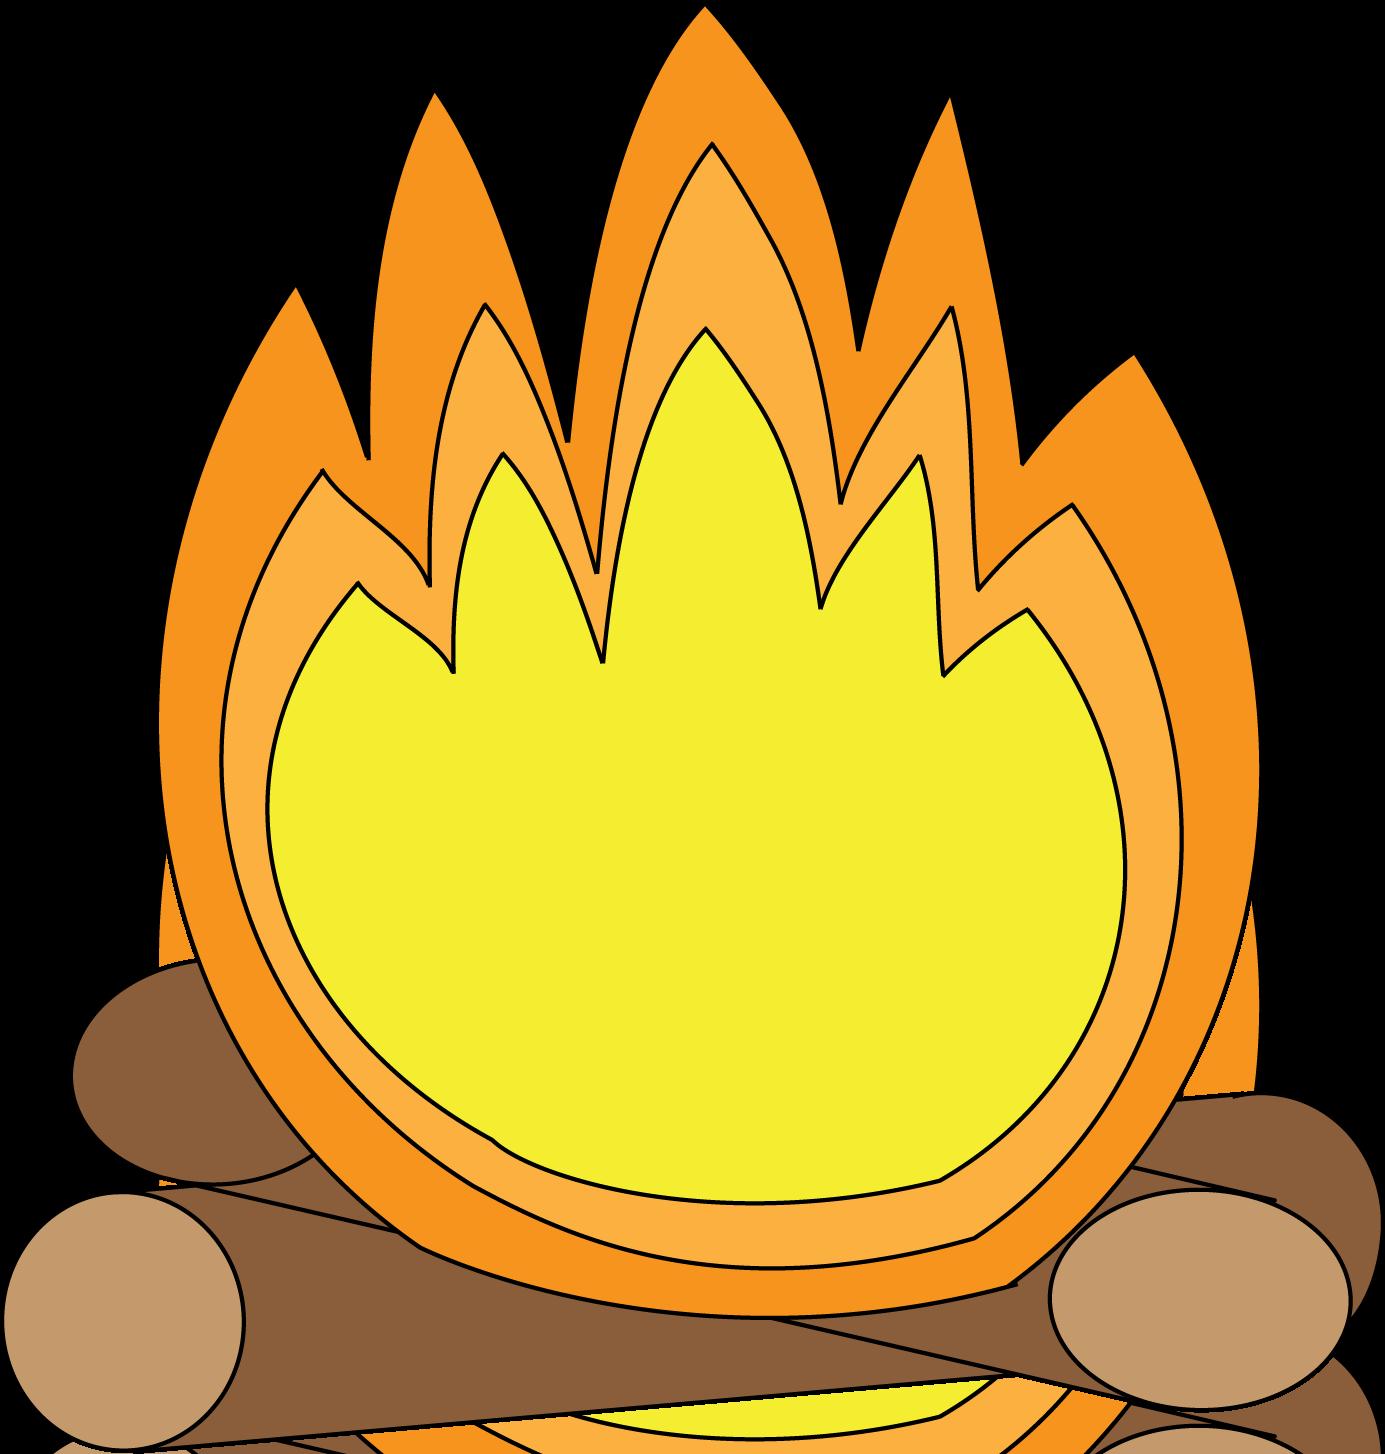 Campfire Smores Clipart-campfire smores clipart-8